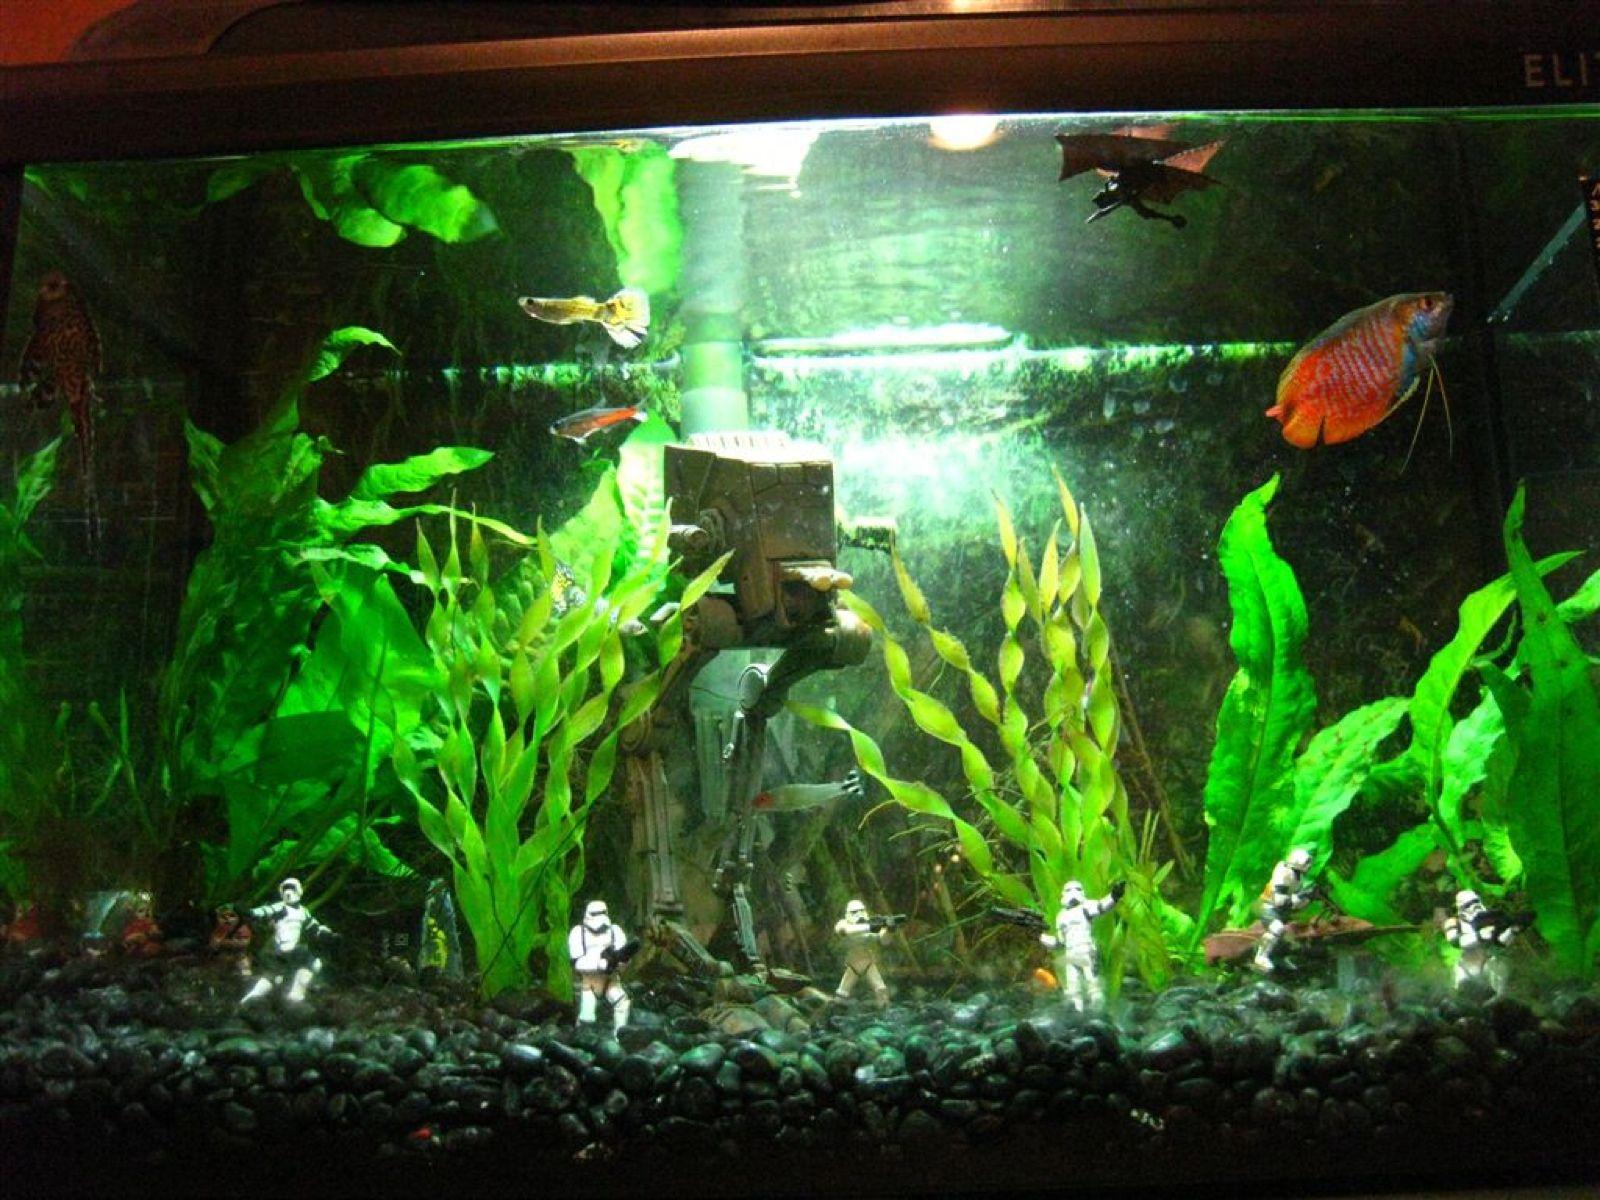 Endorquarium Aquaria Aquarium Star Wars Bedroom Fish Tank